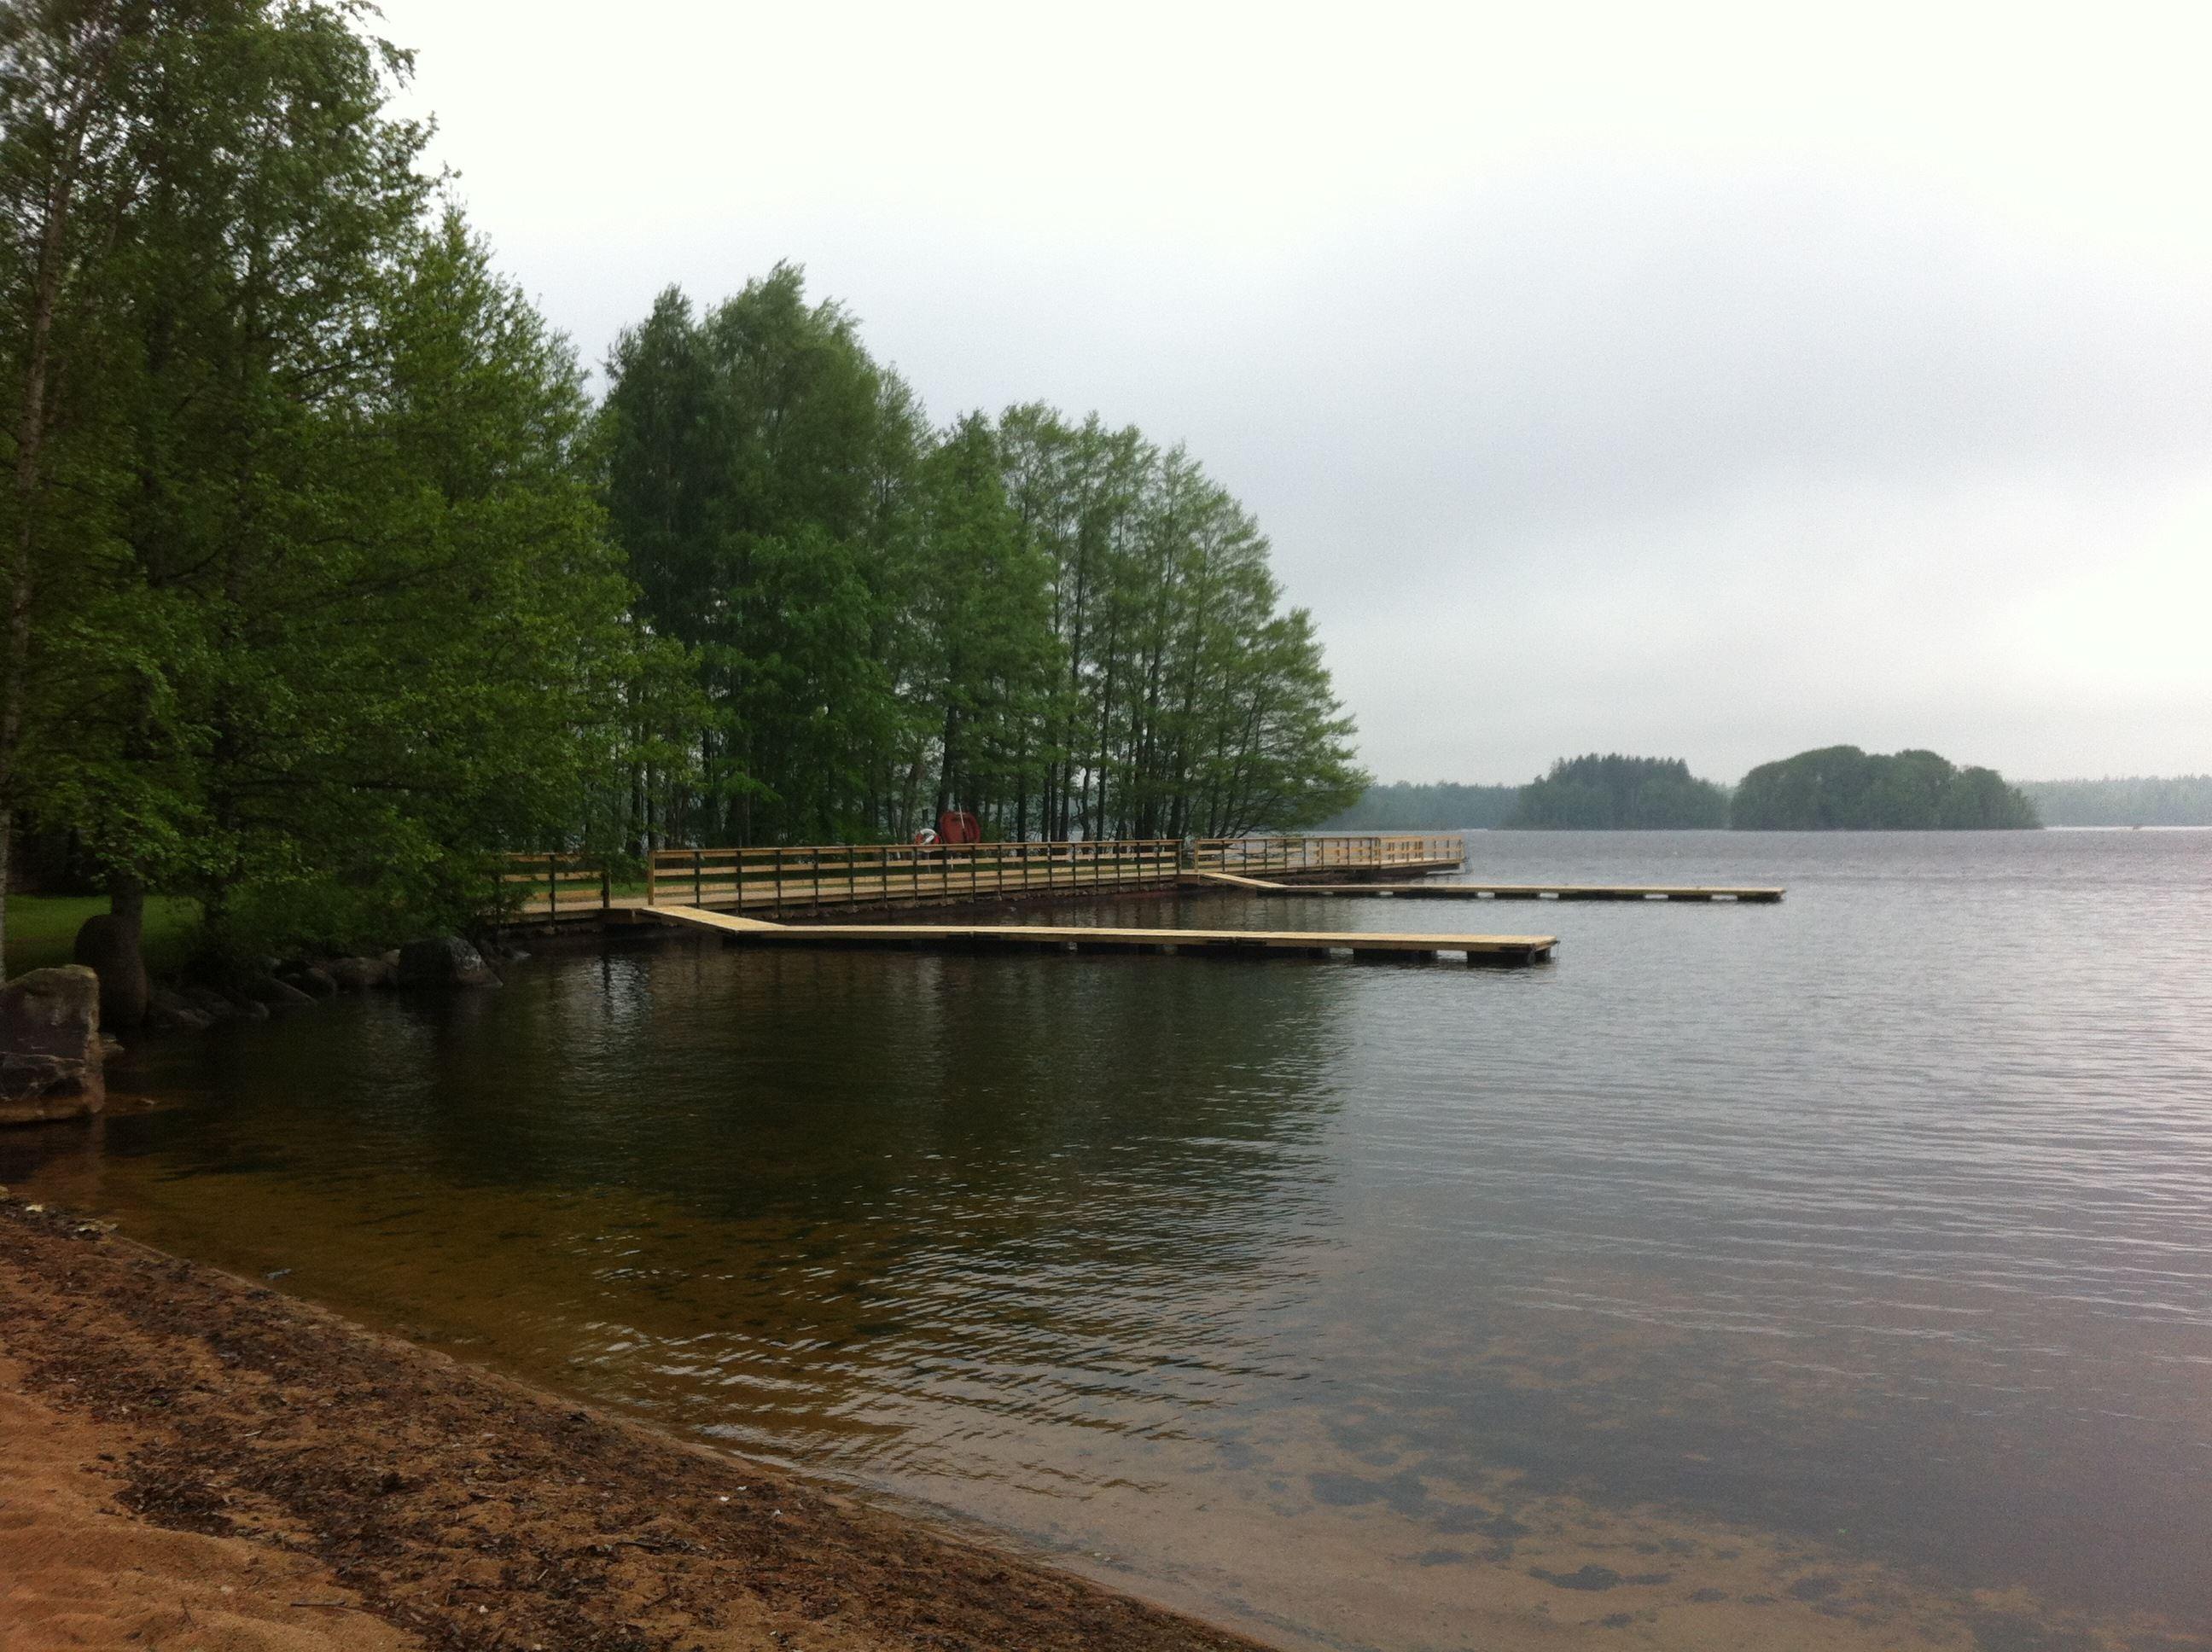 © Tingsryds Kommun, Nature reserve Hensjönäset